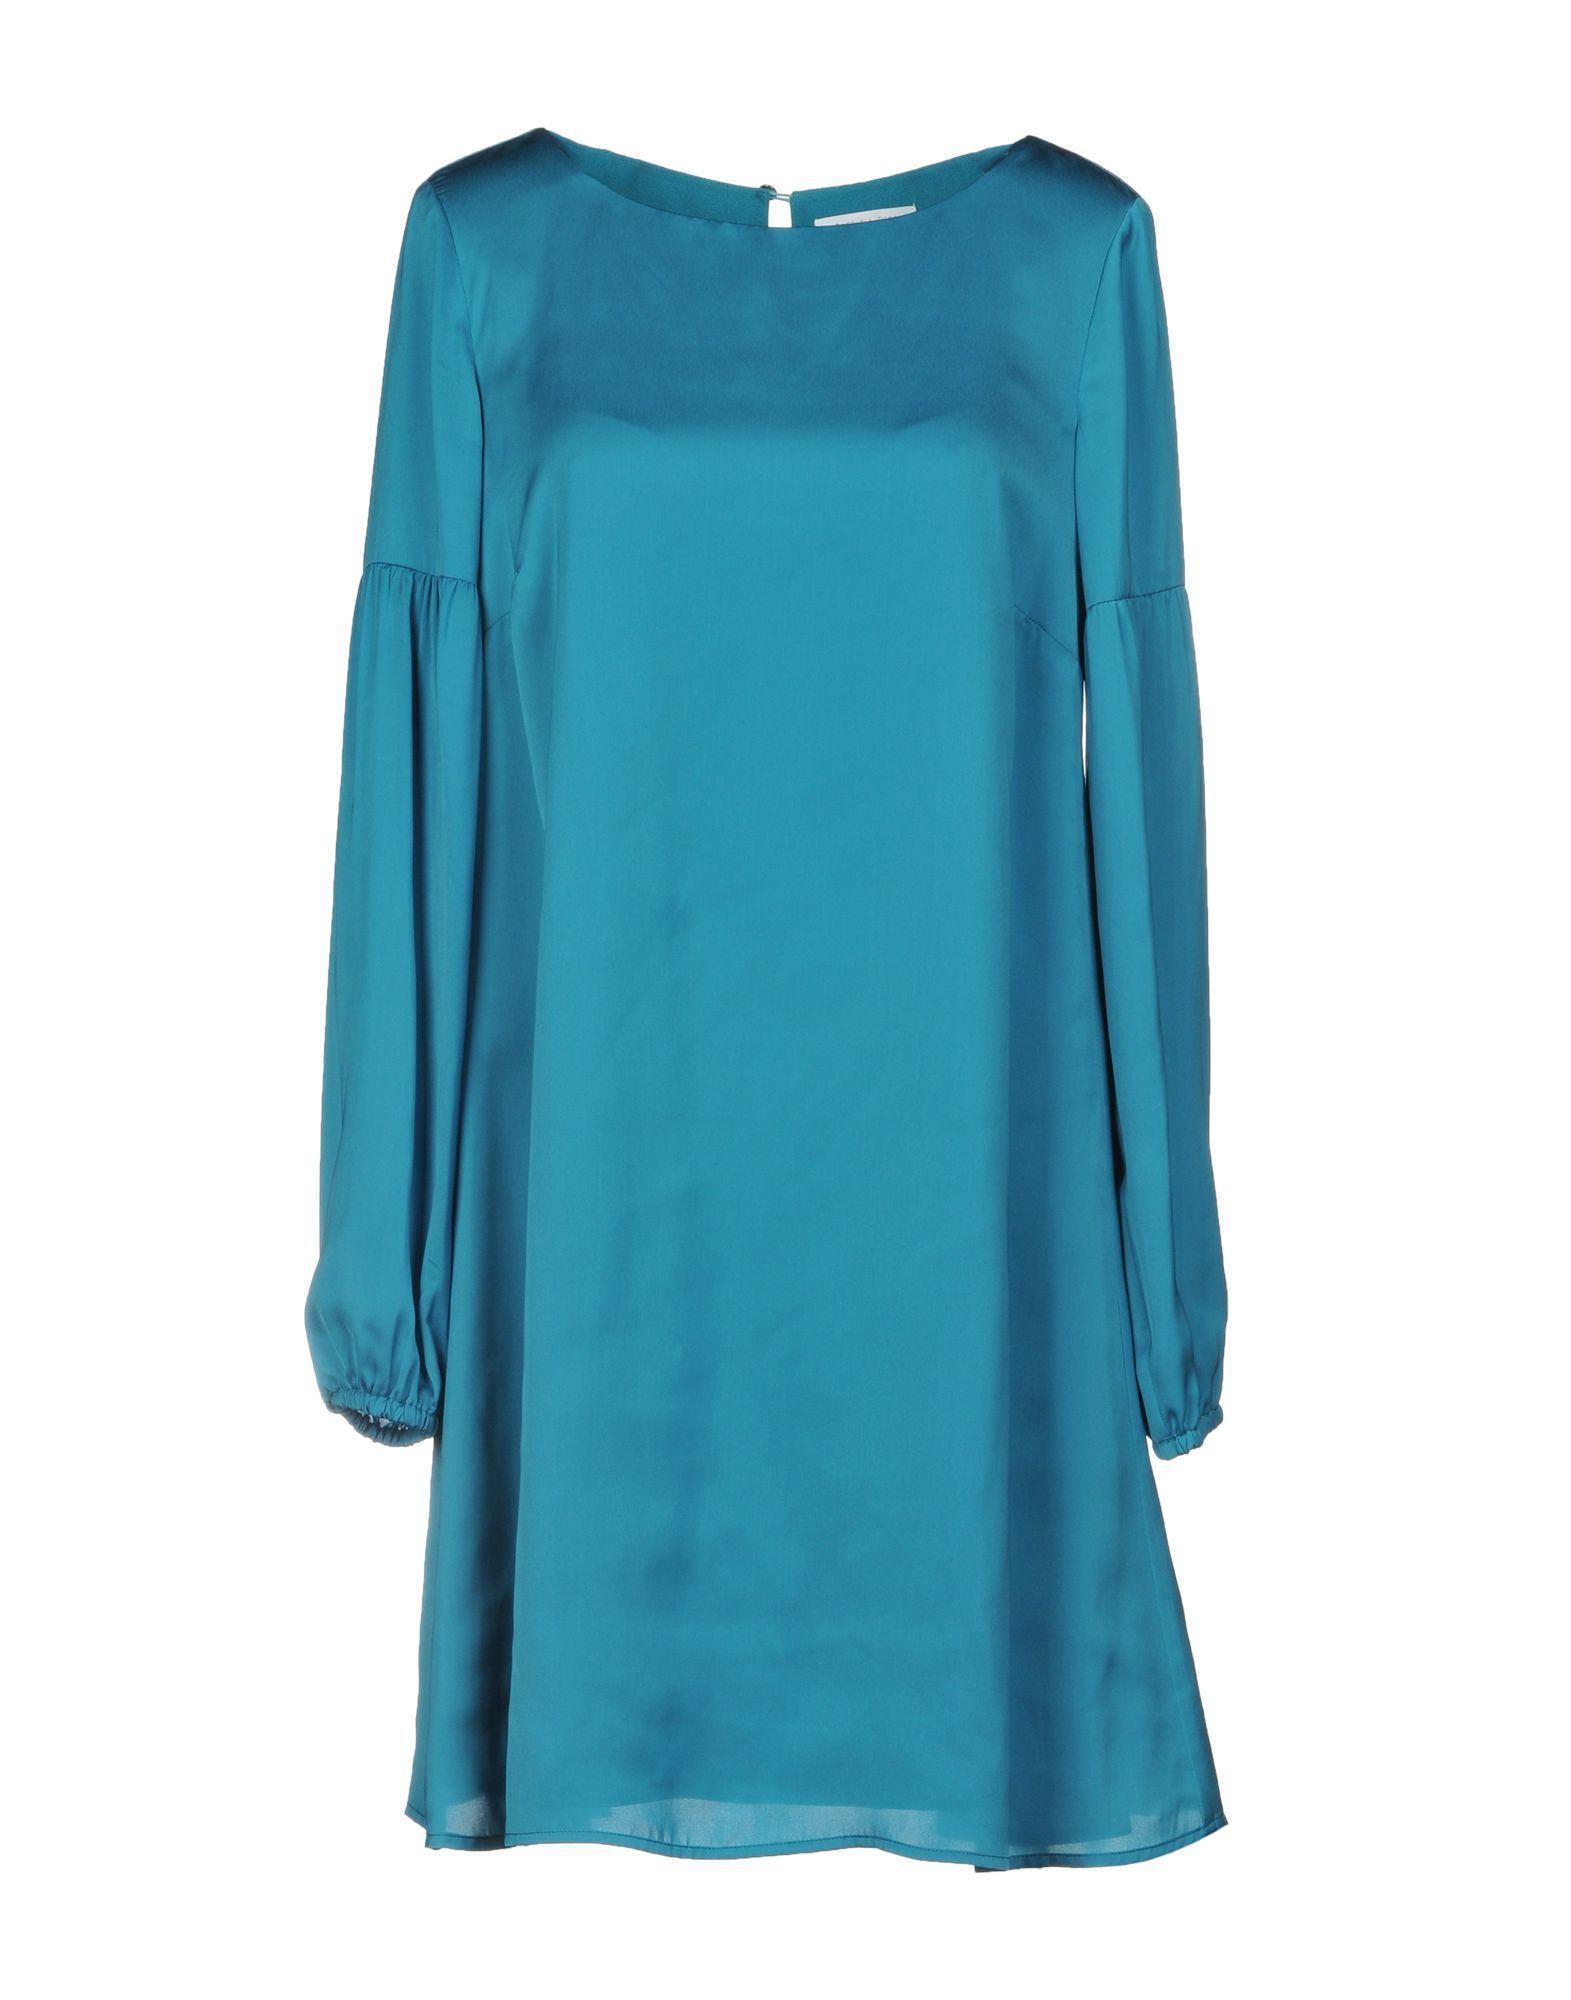 Patrizia Pepe Turquoise Satin Long Sleeve Dress